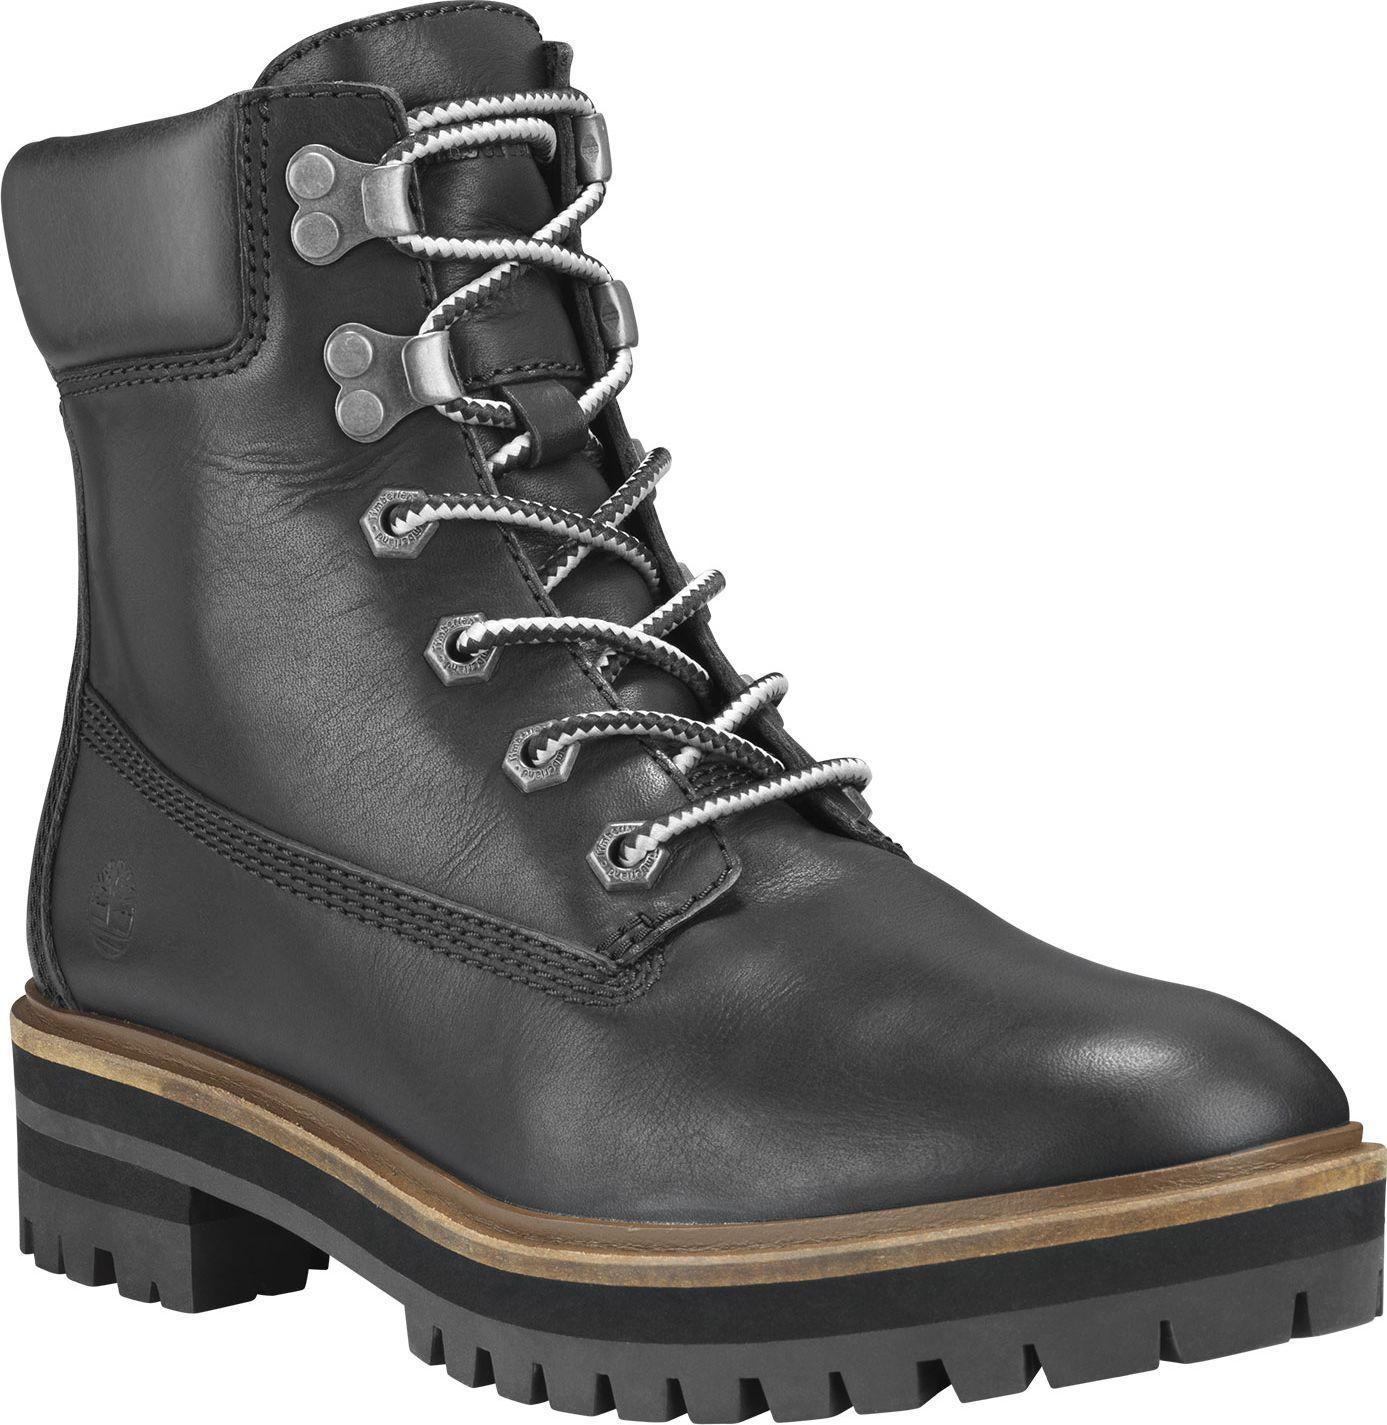 Timberland London Square 6 IN Boot Black Full-Grain 38